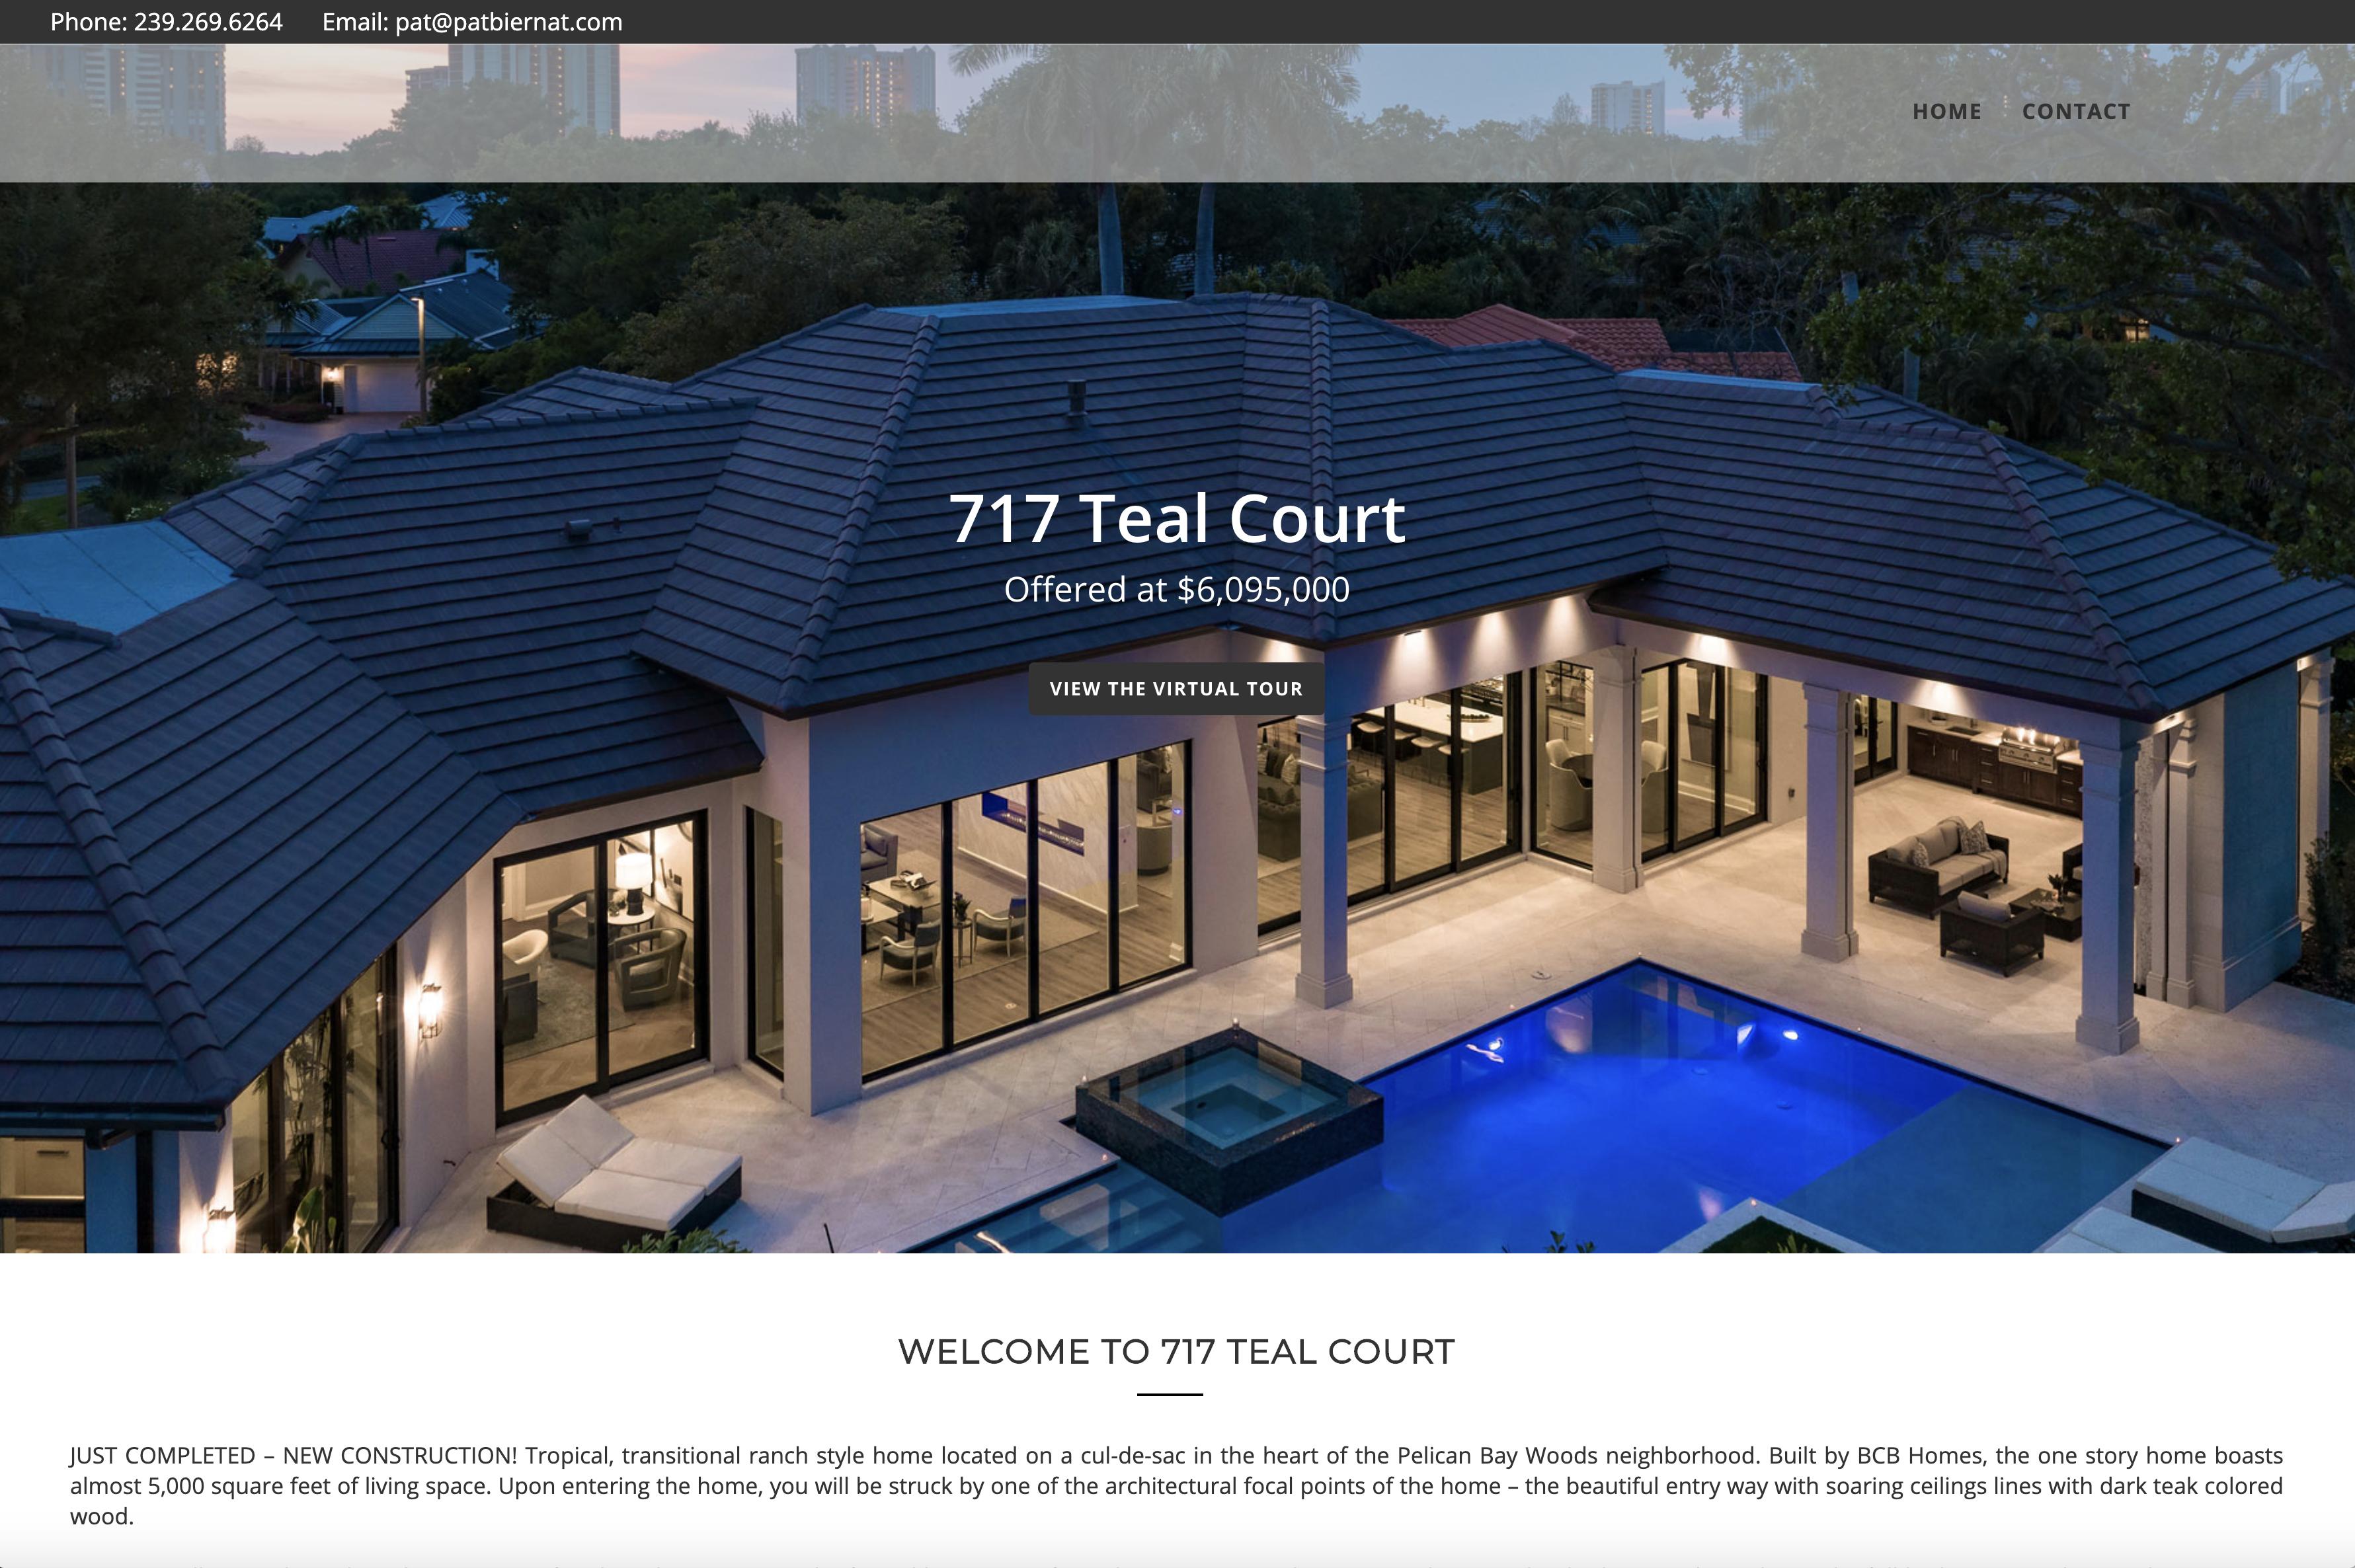 Single Property Web Site